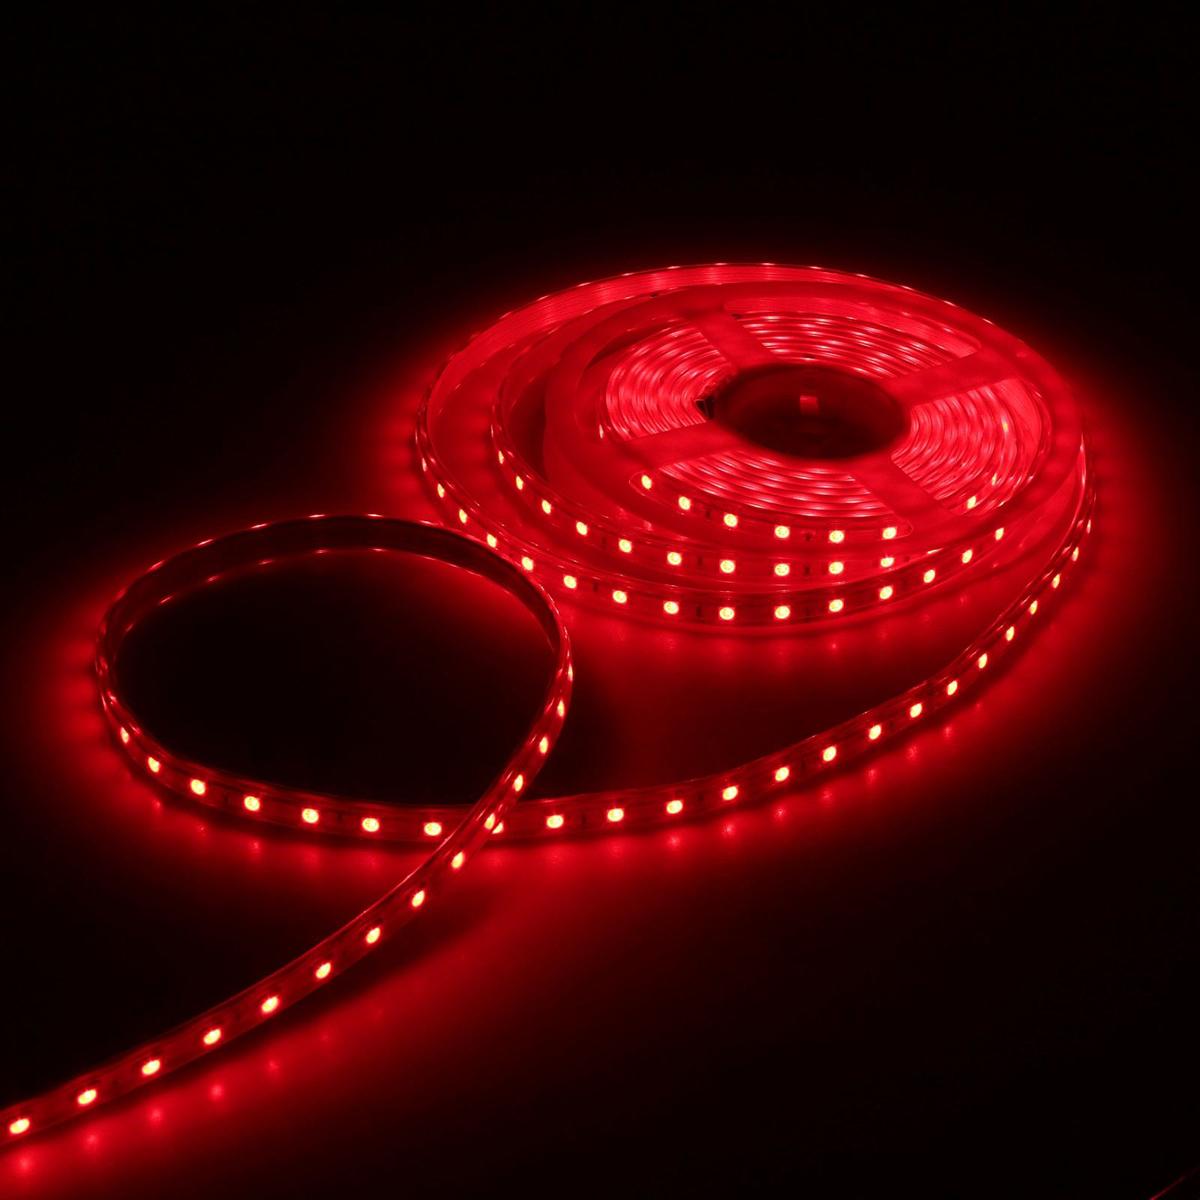 Светодиодная лента Luazon, 220В, SMD5050, длина 5 м, IP65, 60 LED ламп, 11 Вт/м, 16-18 Лм/1 LED, AC, цвет: красный ac 65 автостоп